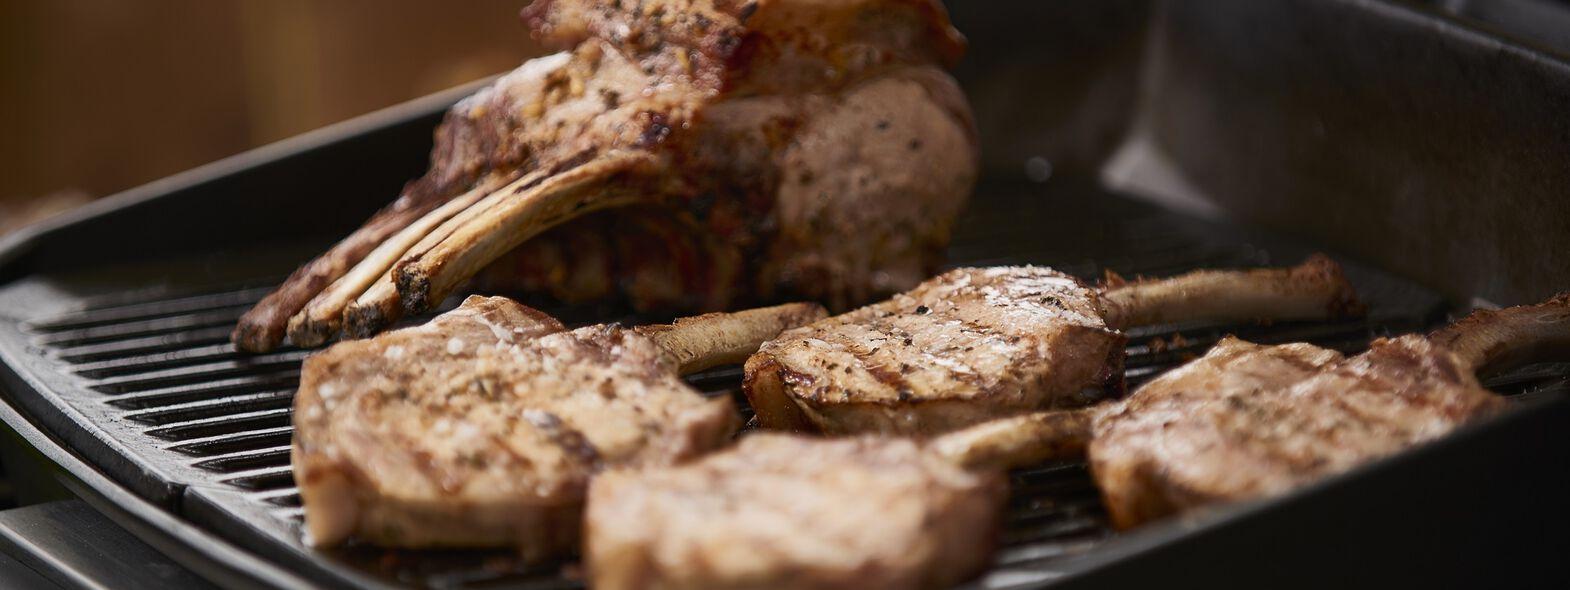 Steak & Burgers